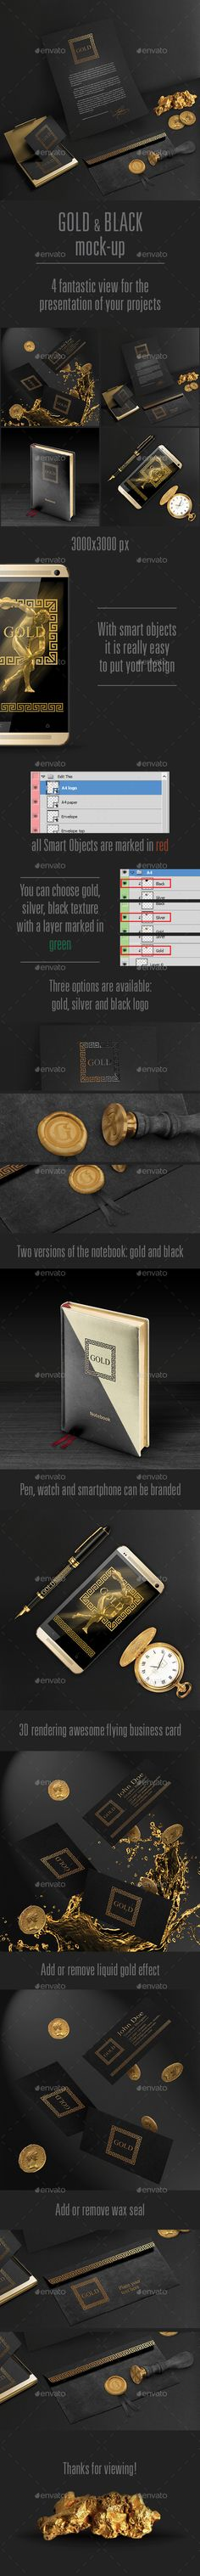 Gold and Black Stationary / Branding Mock-Up